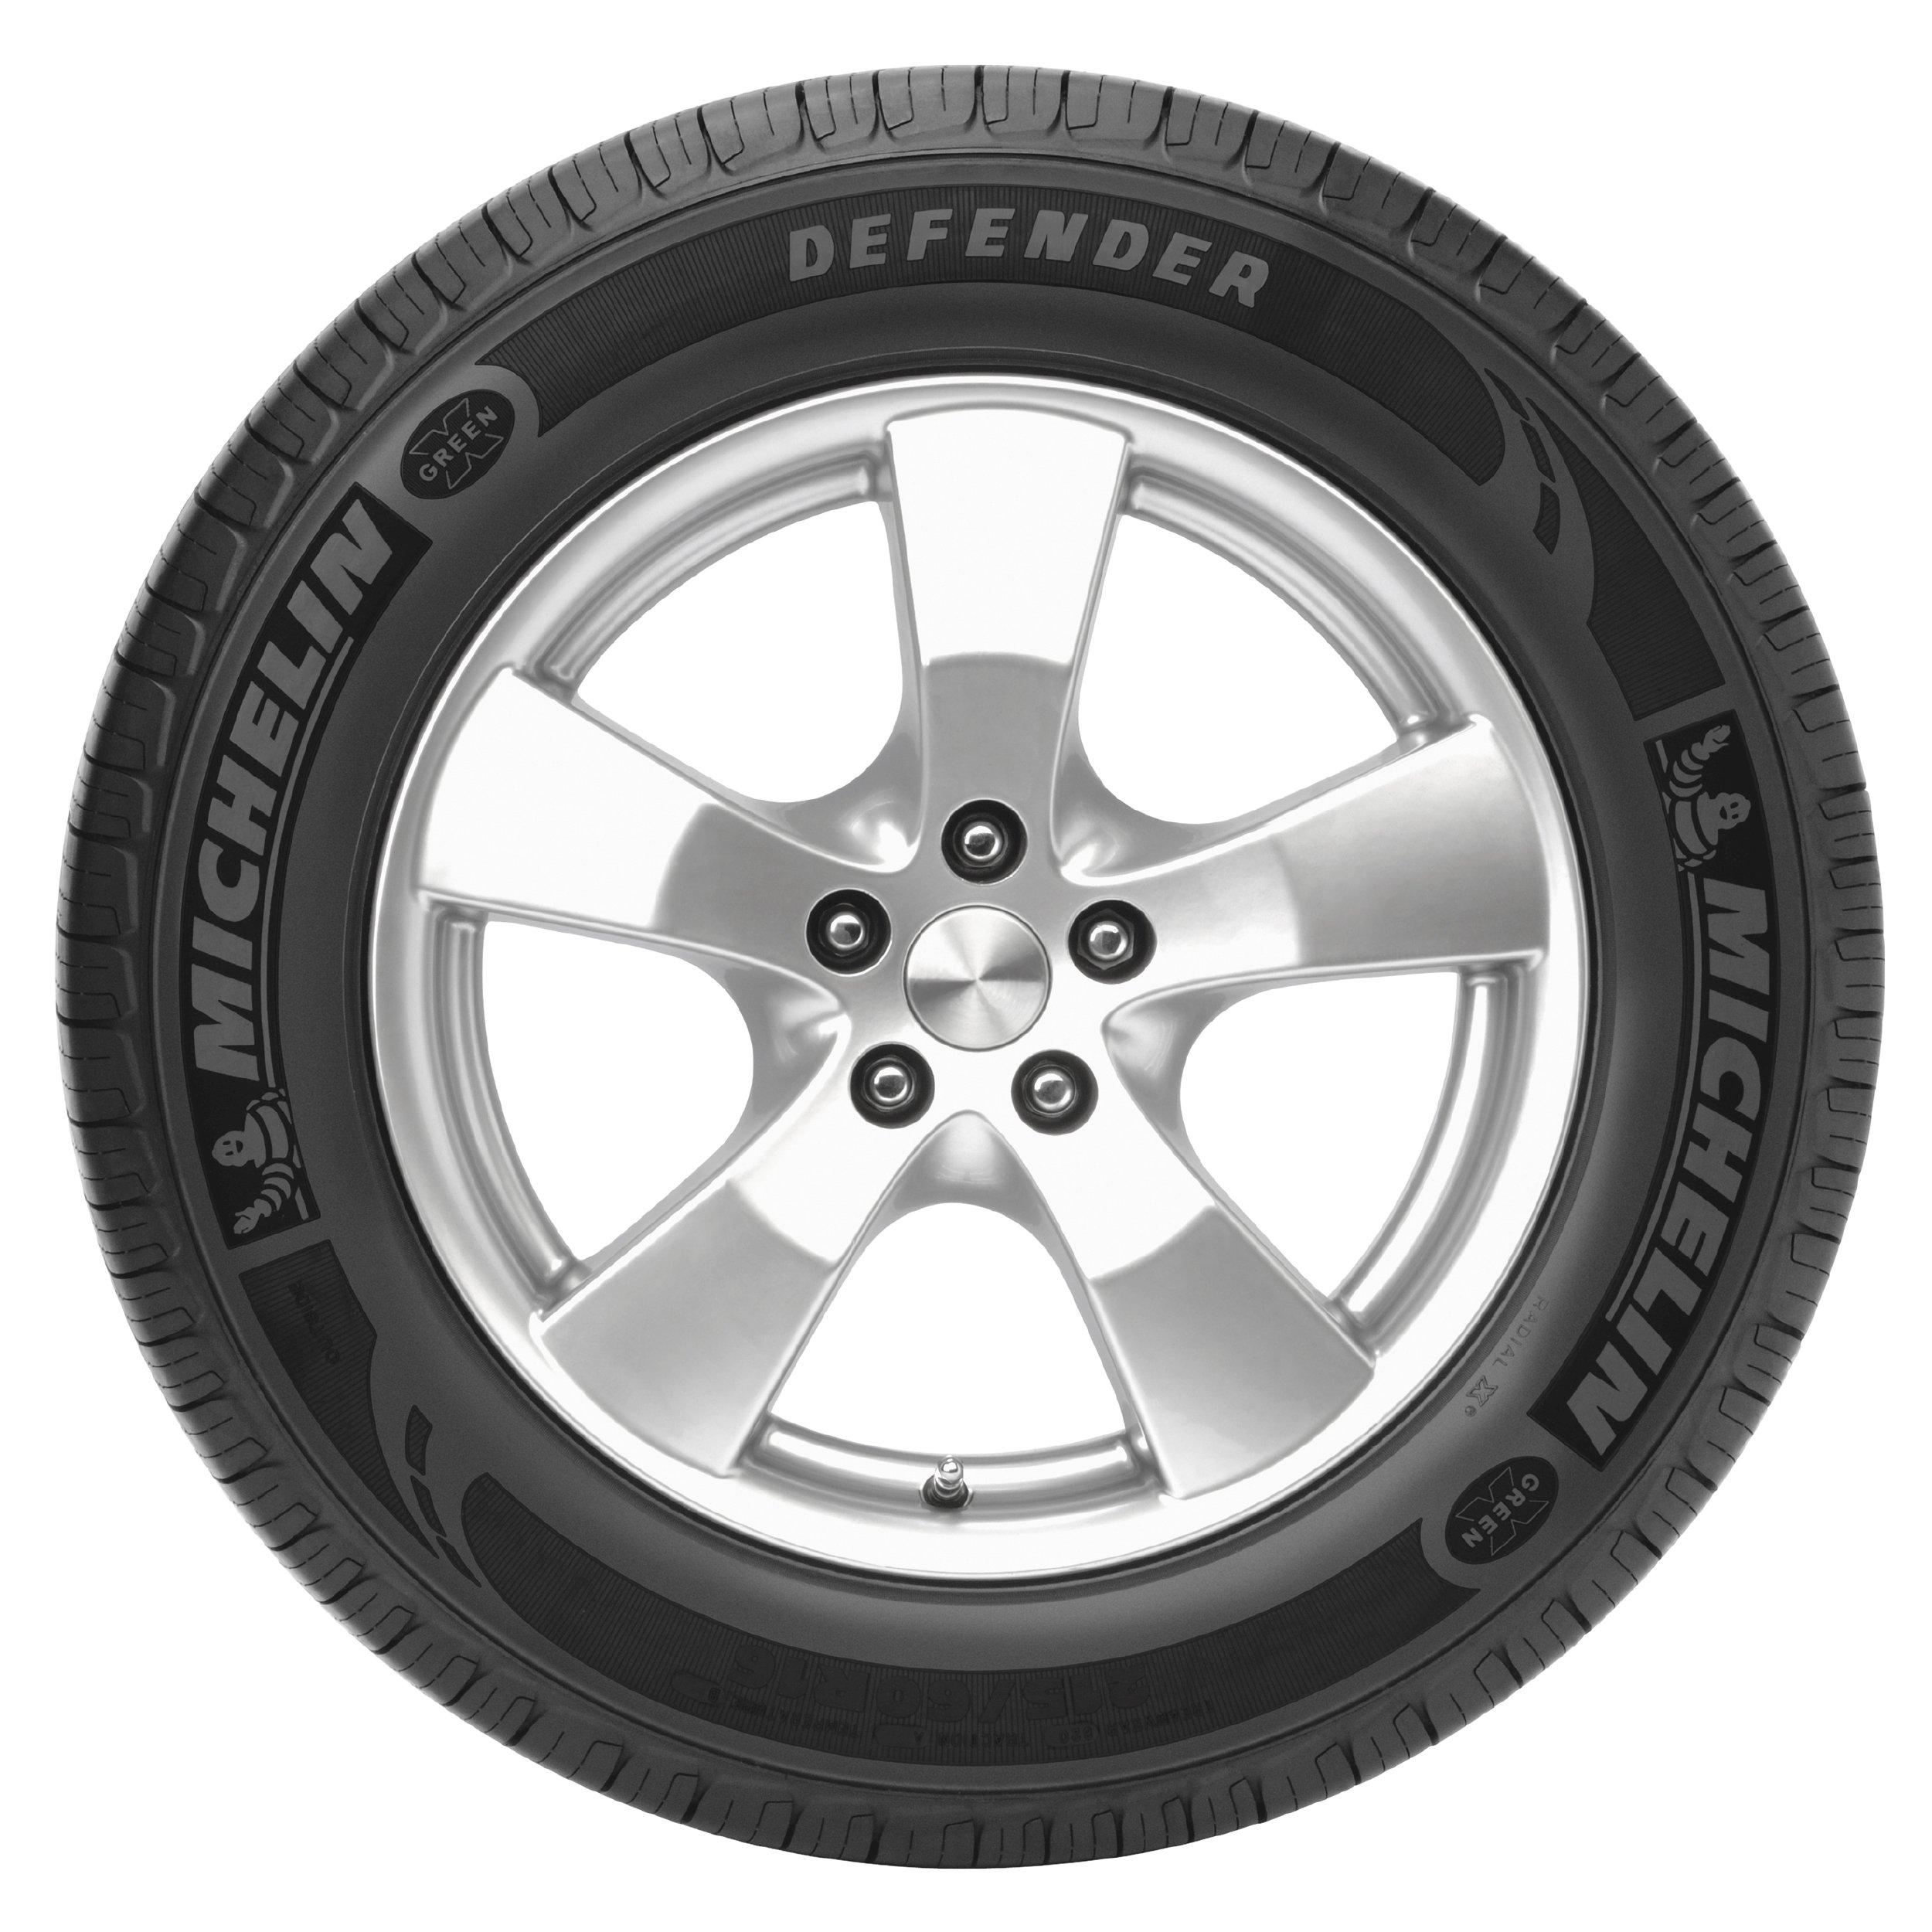 Michelin Defender All-Season Radial Tire - 215/60R16 95T